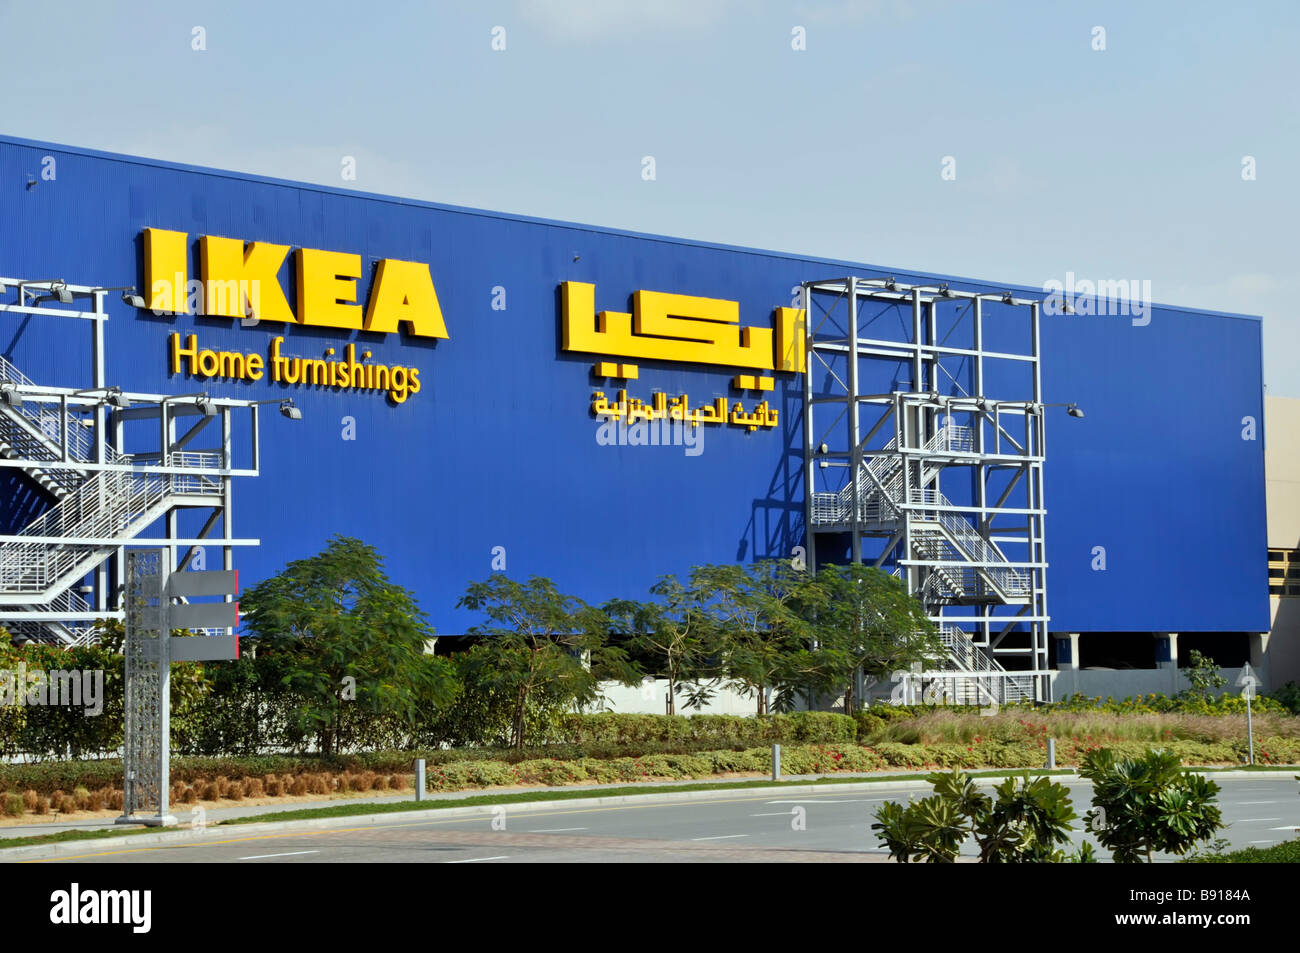 Ikea Dubai 28 Images Ikea Dubai Festival City United Arab Emirates Dinodxbdino From Athens